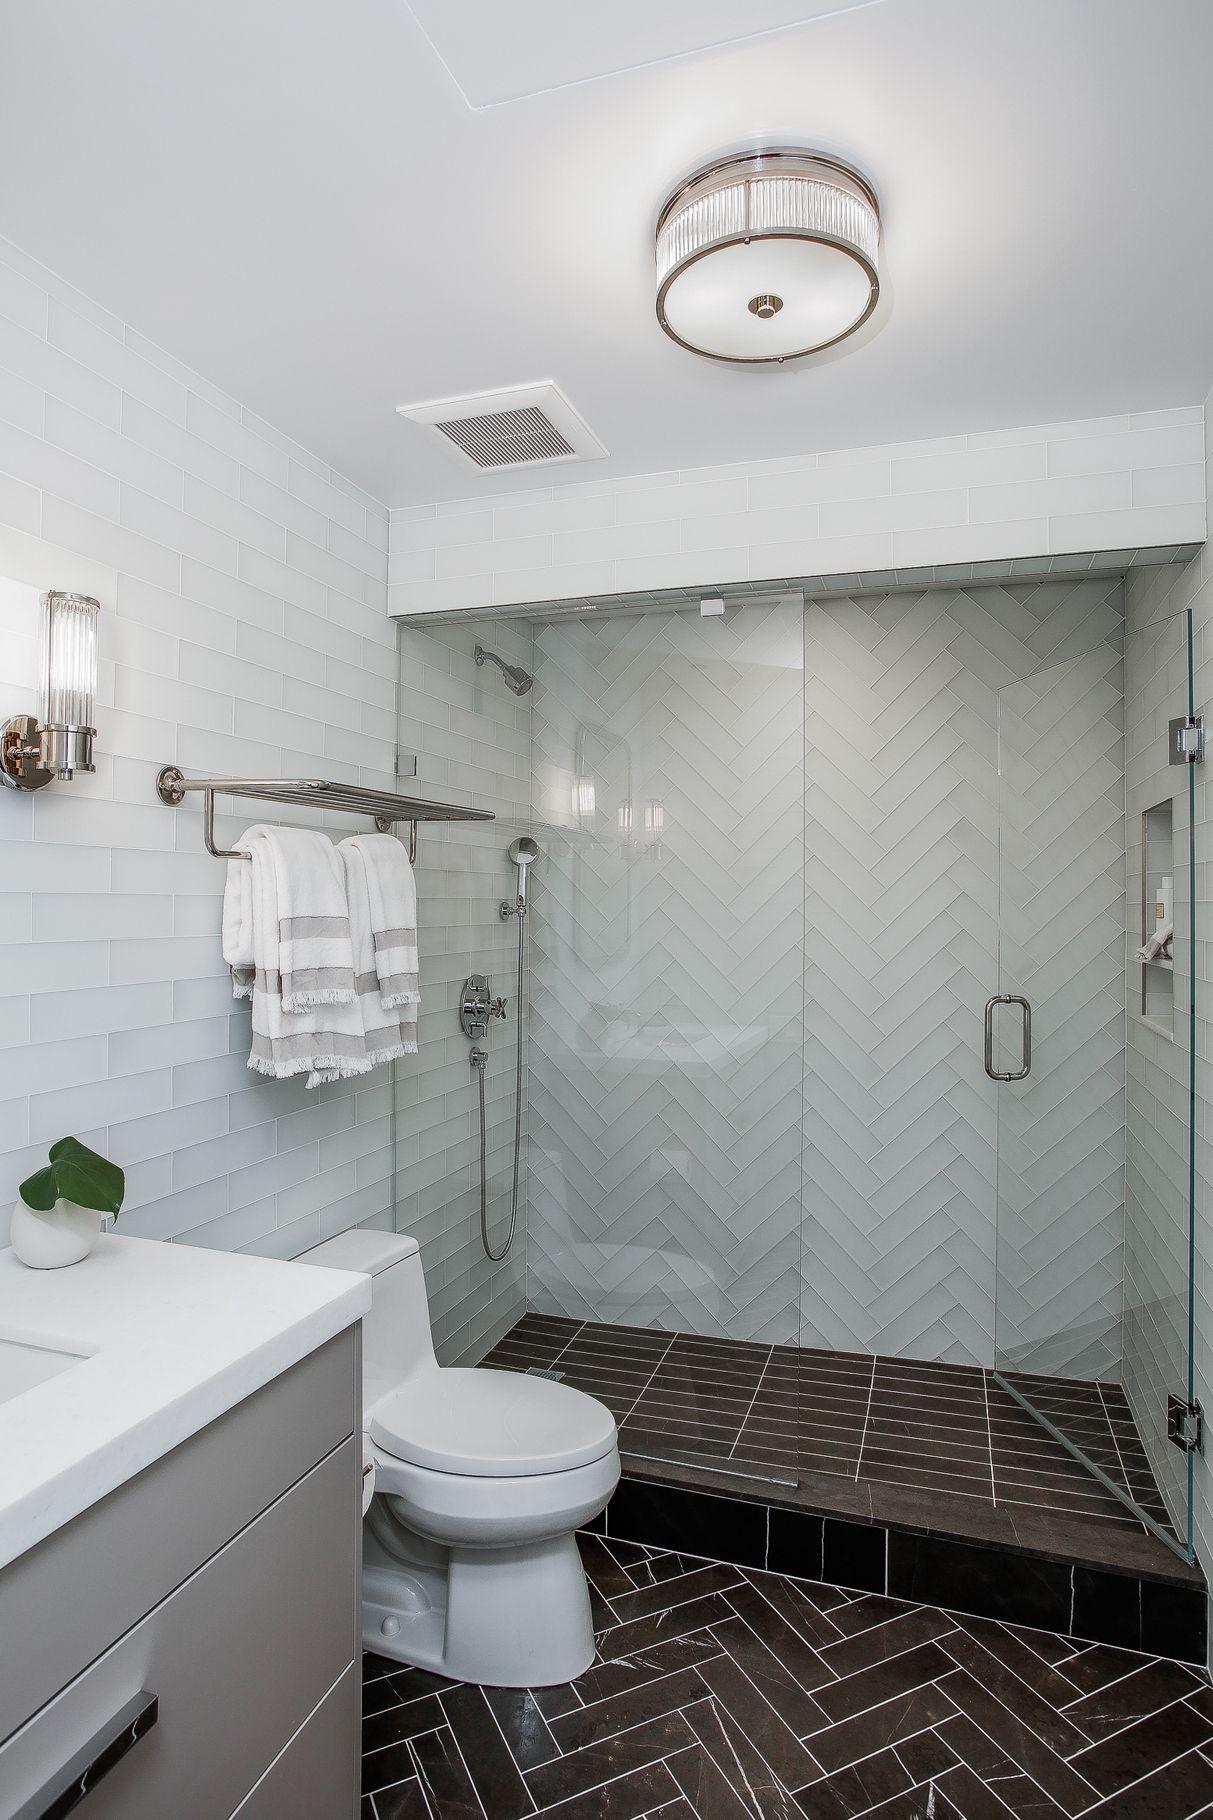 Fully Tiled Bathroom Walls Herringbone Tile Frame Less Gl Shower Door And Niche For